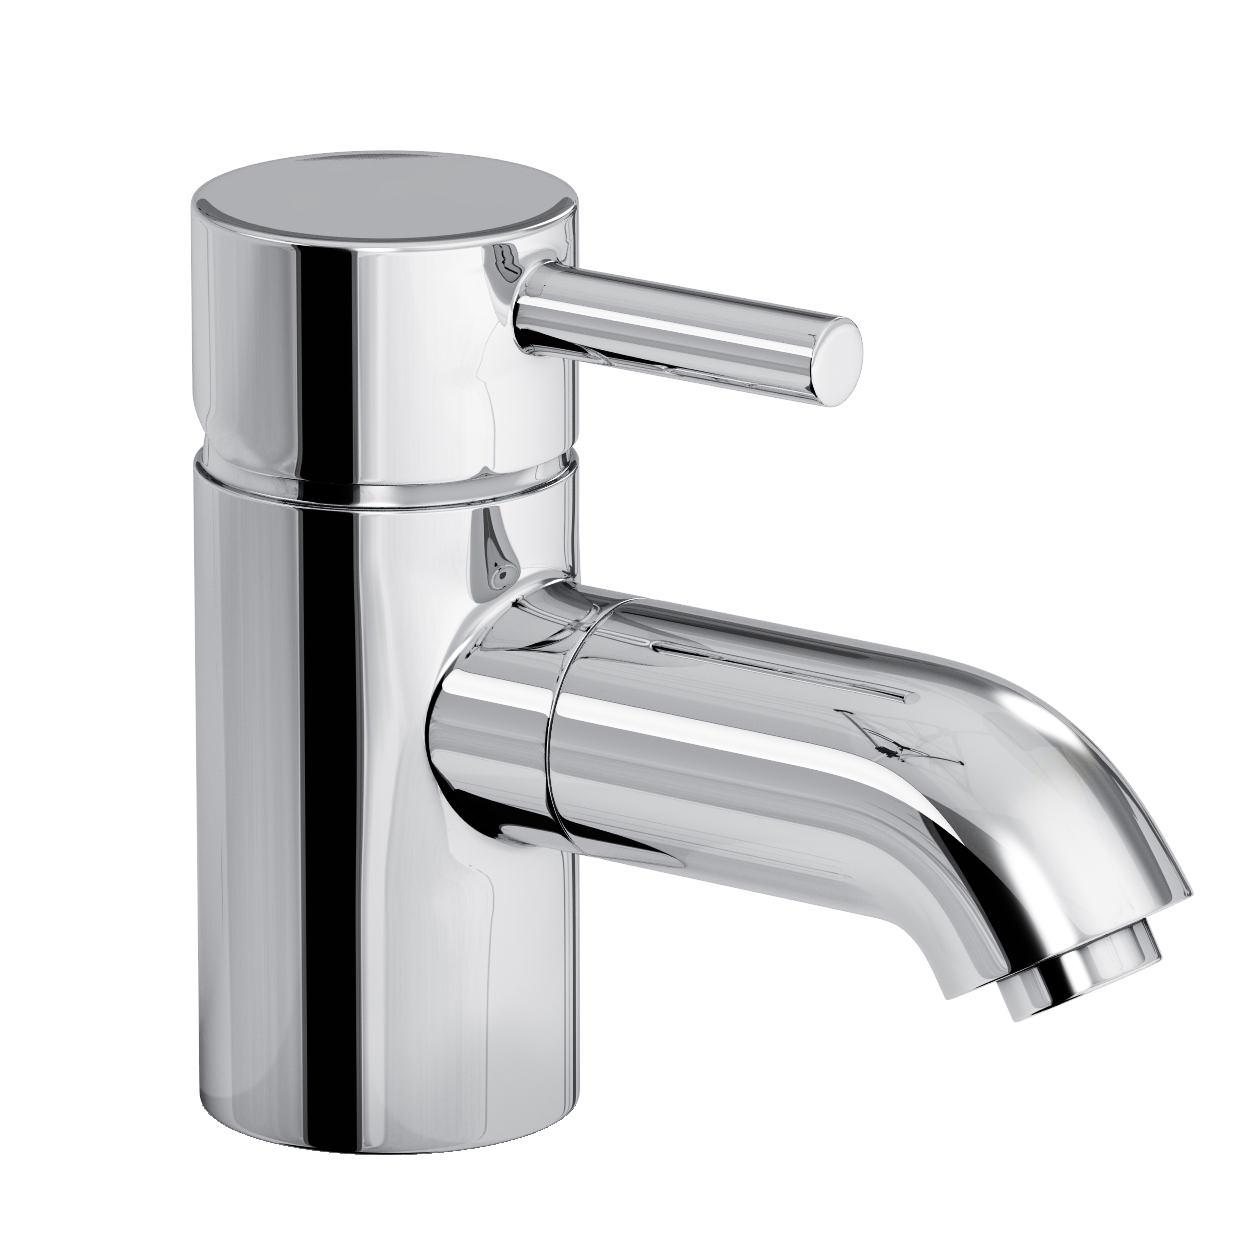 Abode harmonie single lever bath filler tap ab1192 for Bathroom accessories taps